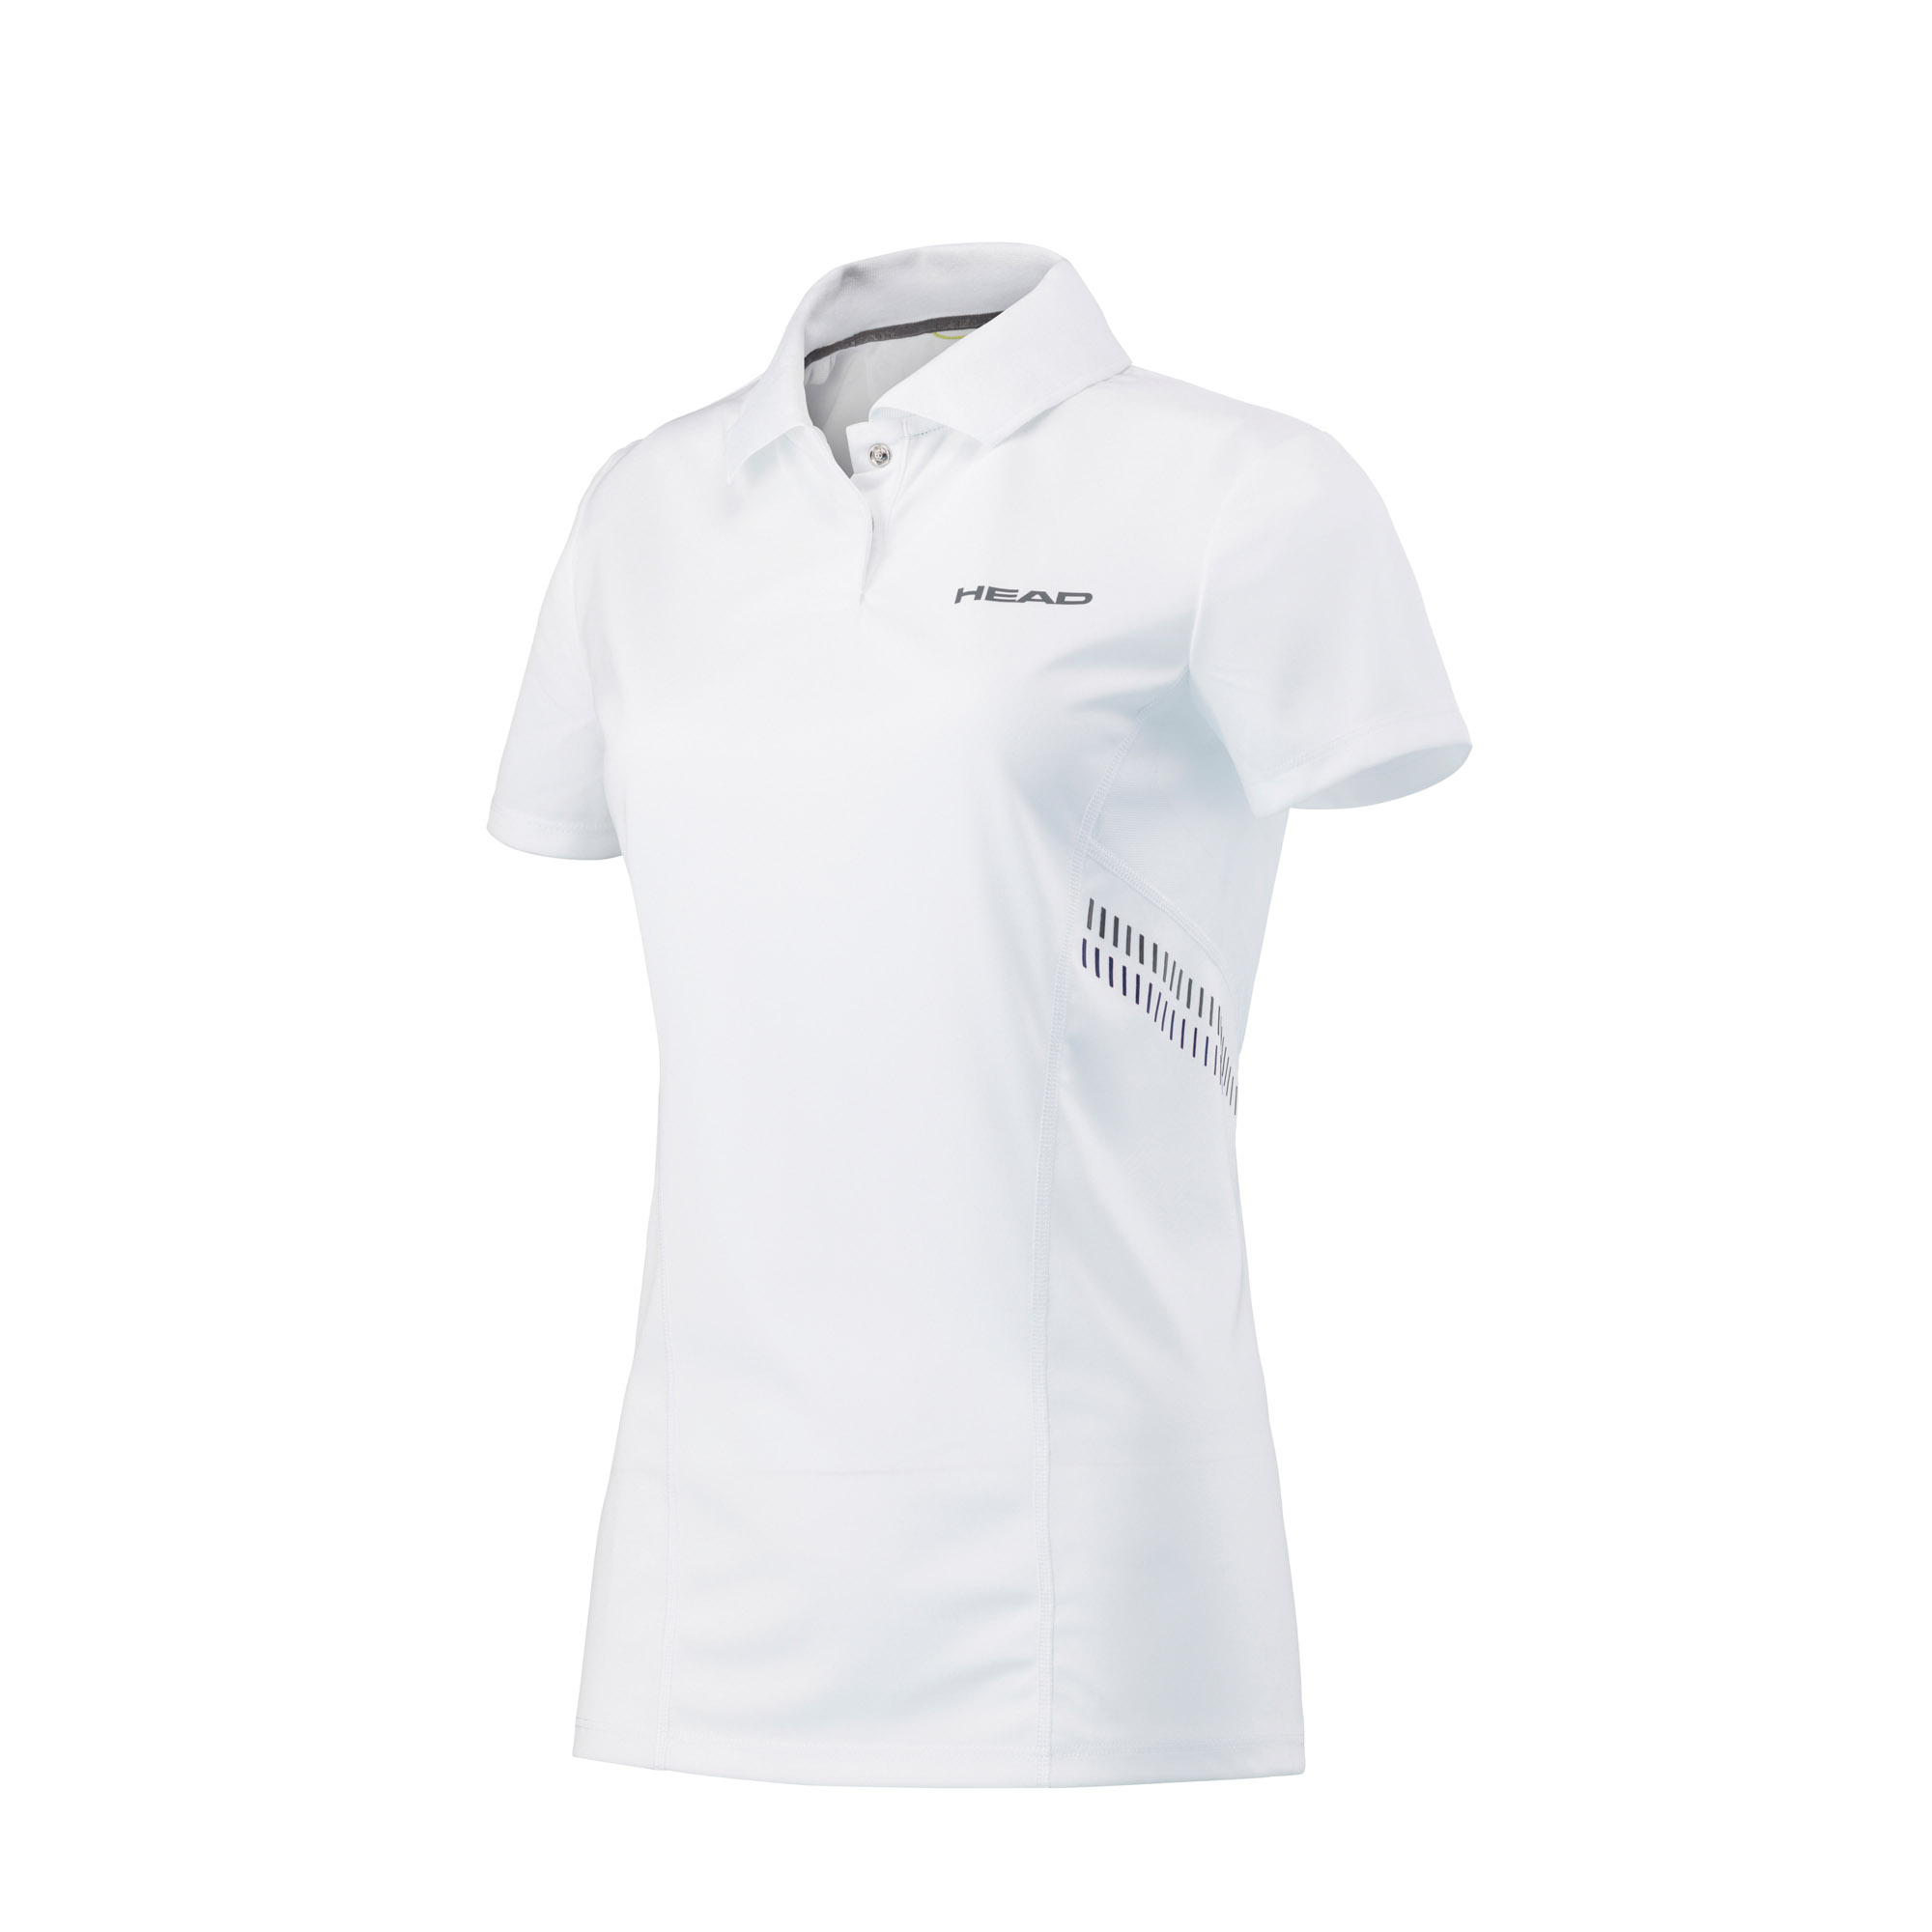 Head Club Technical Girls Polo Shirt - White/Navy, L